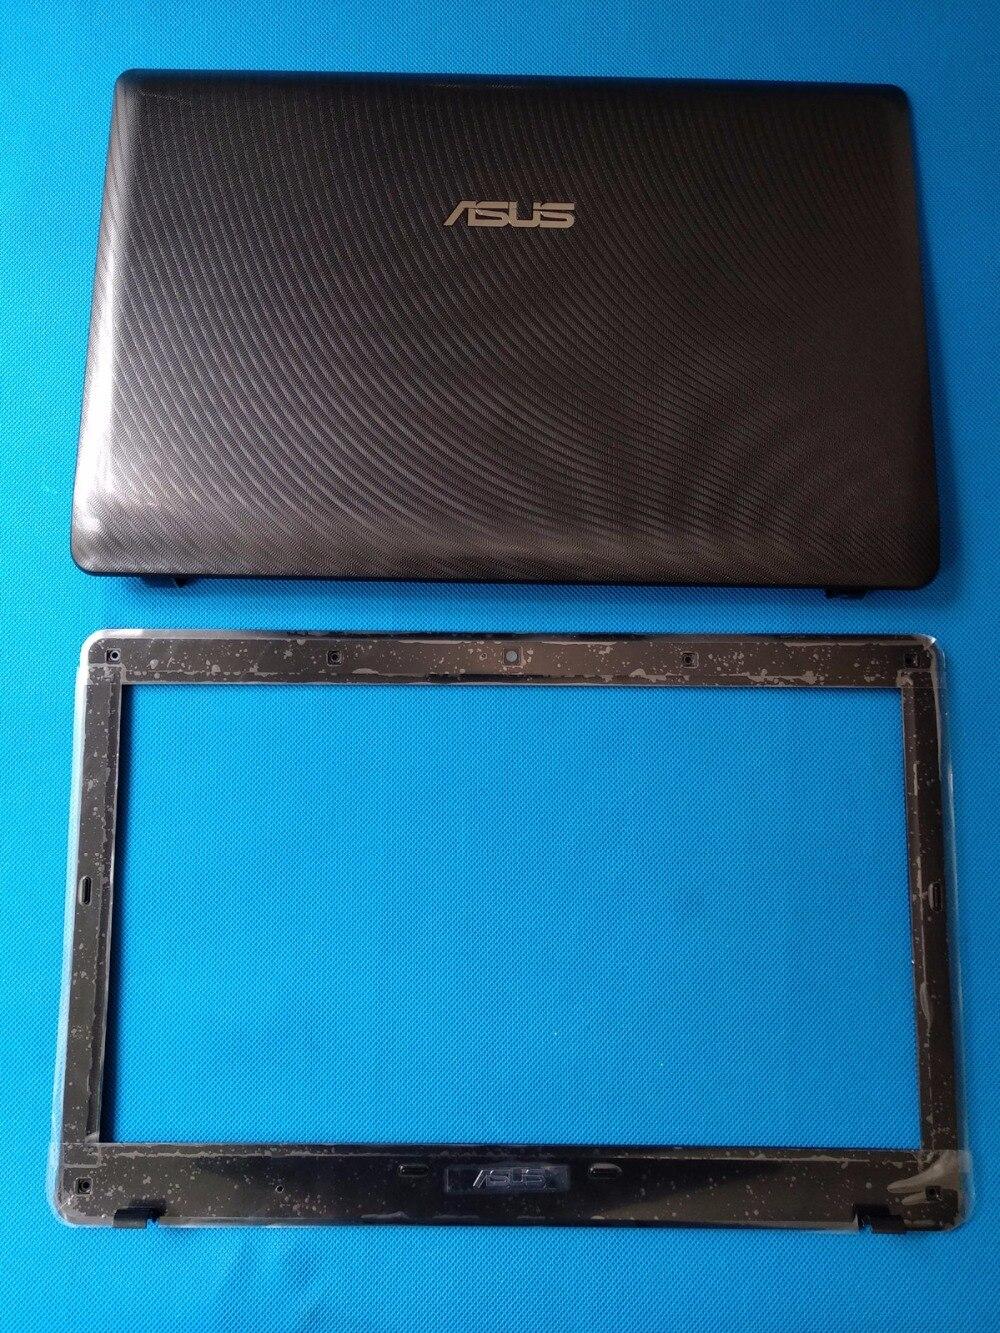 New for Asus K52 K52F K52J A52 X52 K52JR K52JK LCD Rear Case & Front Bezel Lid Cover